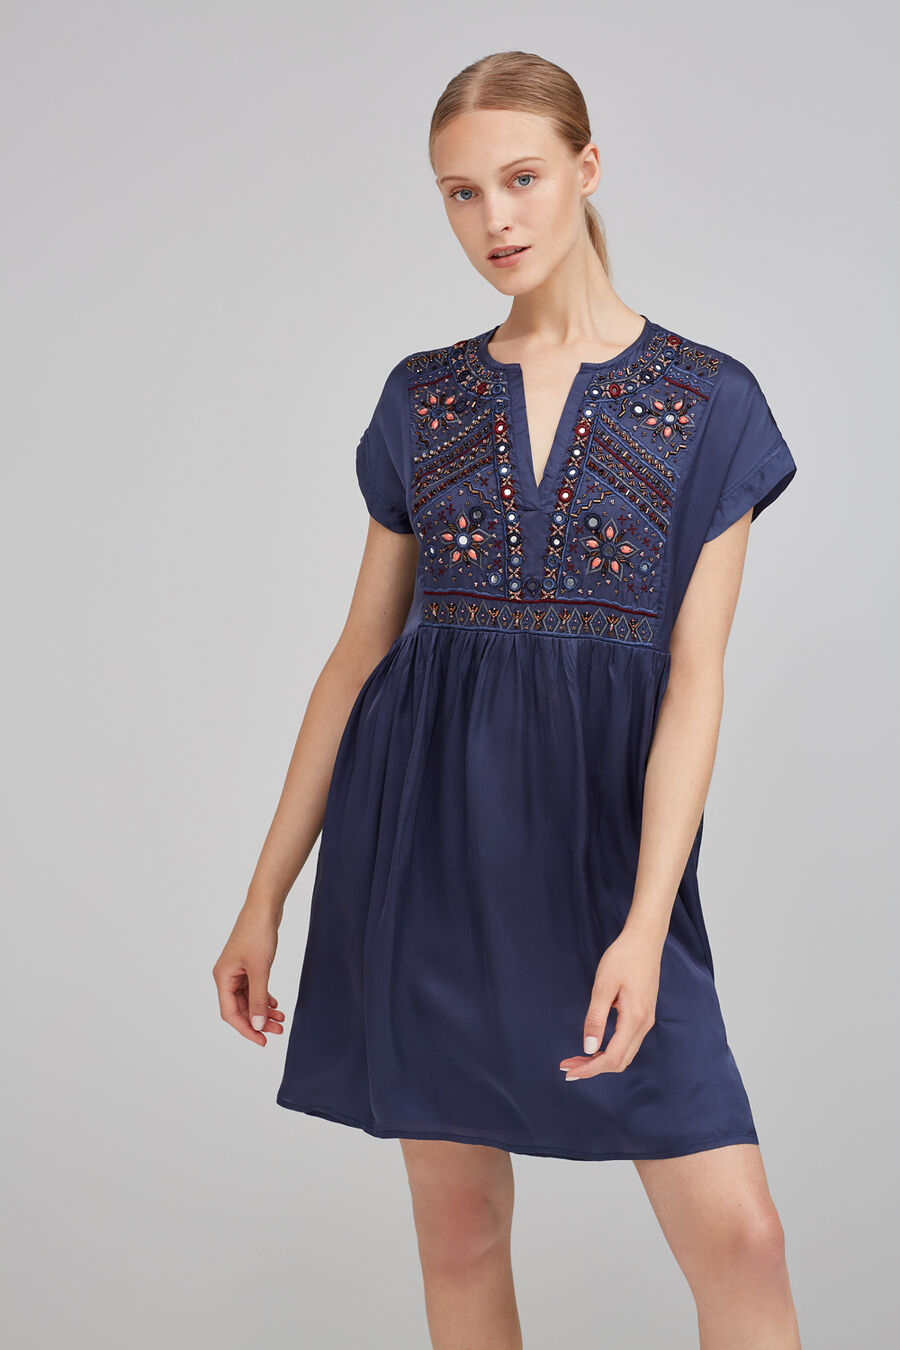 Mirrors dress